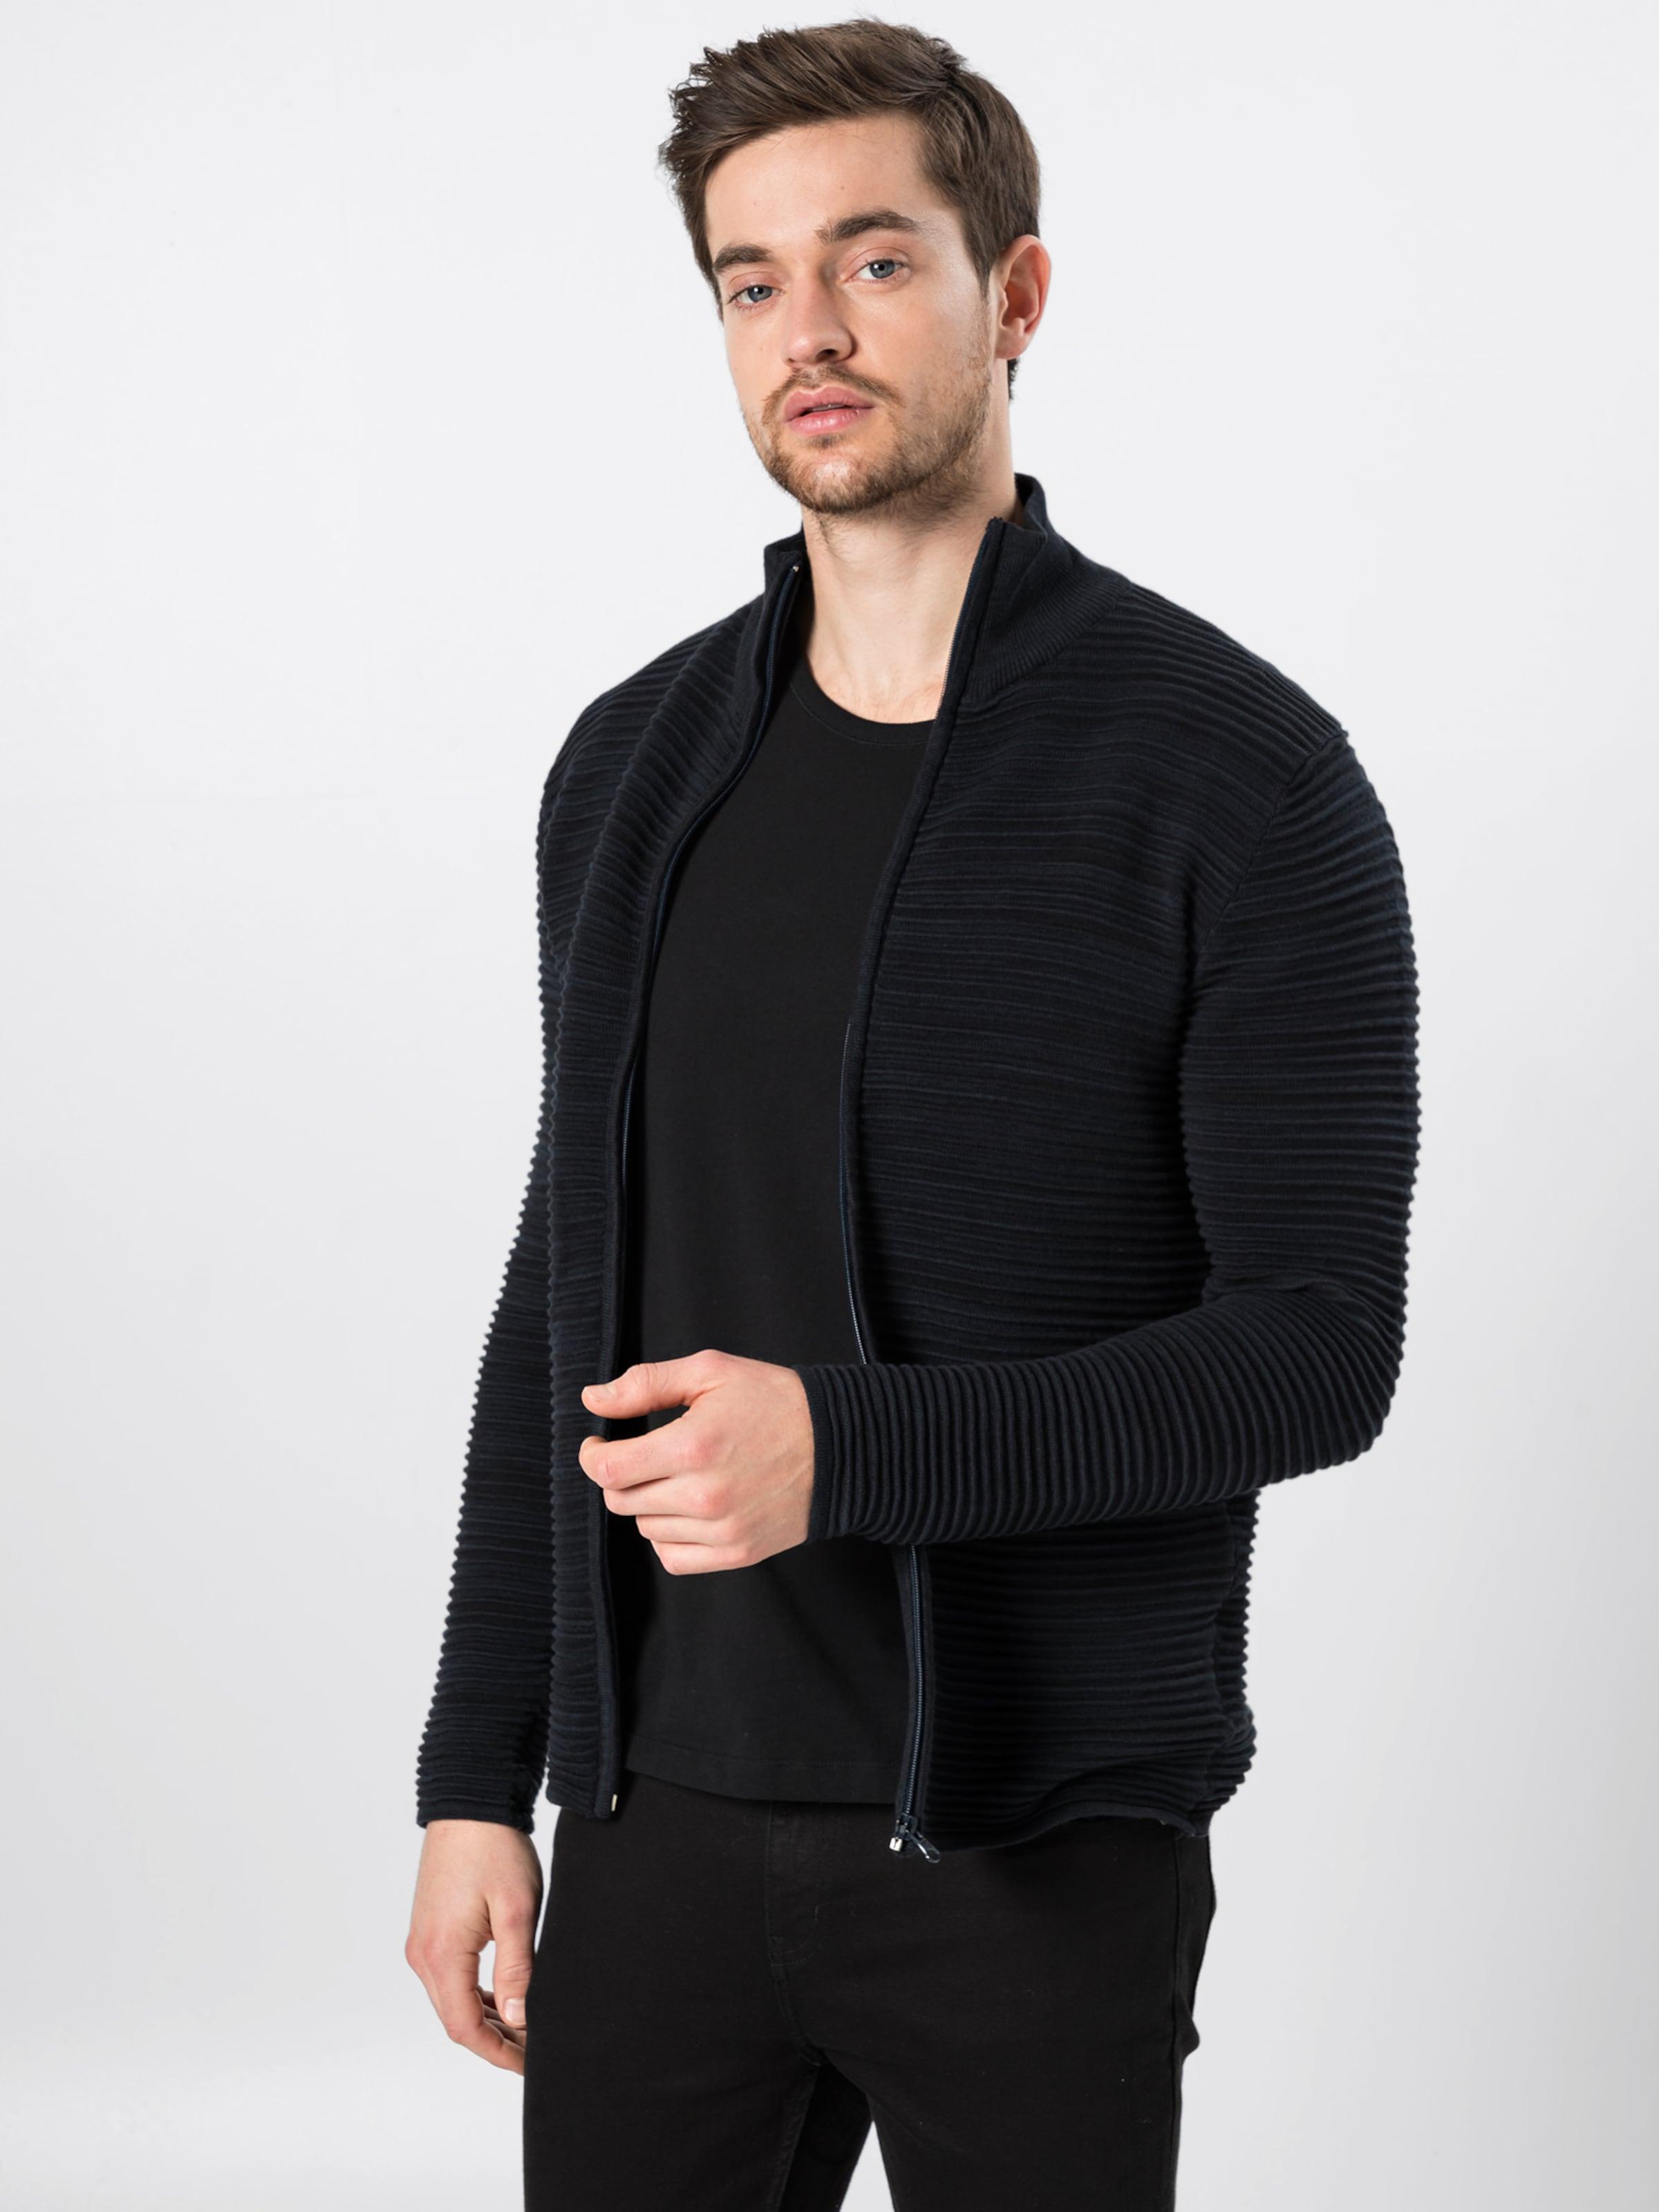 Dunkelblau solid In Zip' Strickjacke 'knitStruan DIW2eH9EY